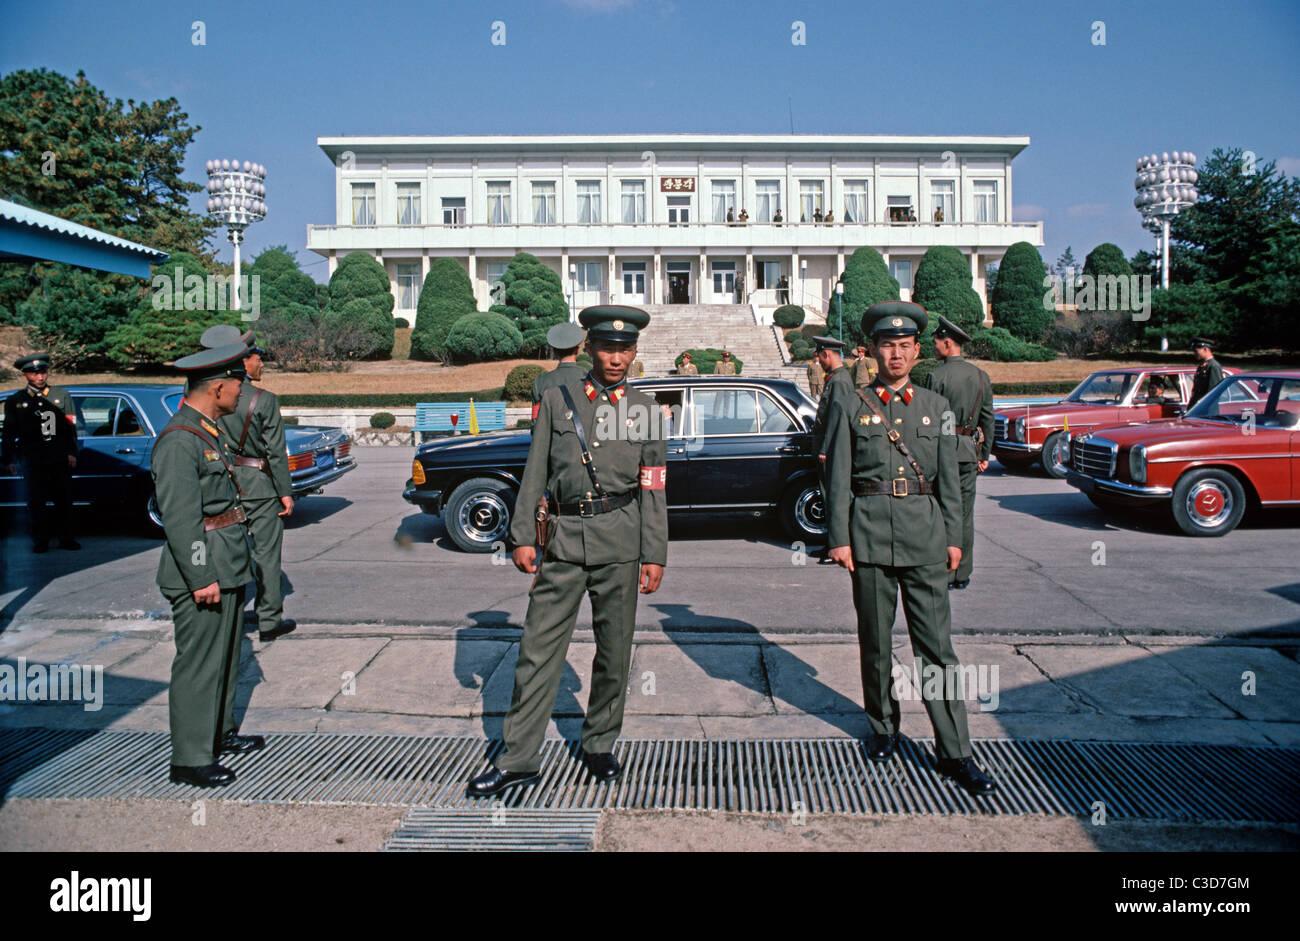 North Korean Guards, KPA, Korean People's Army, DMZ Line at Panmunjon between North and South Korea - Stock Image